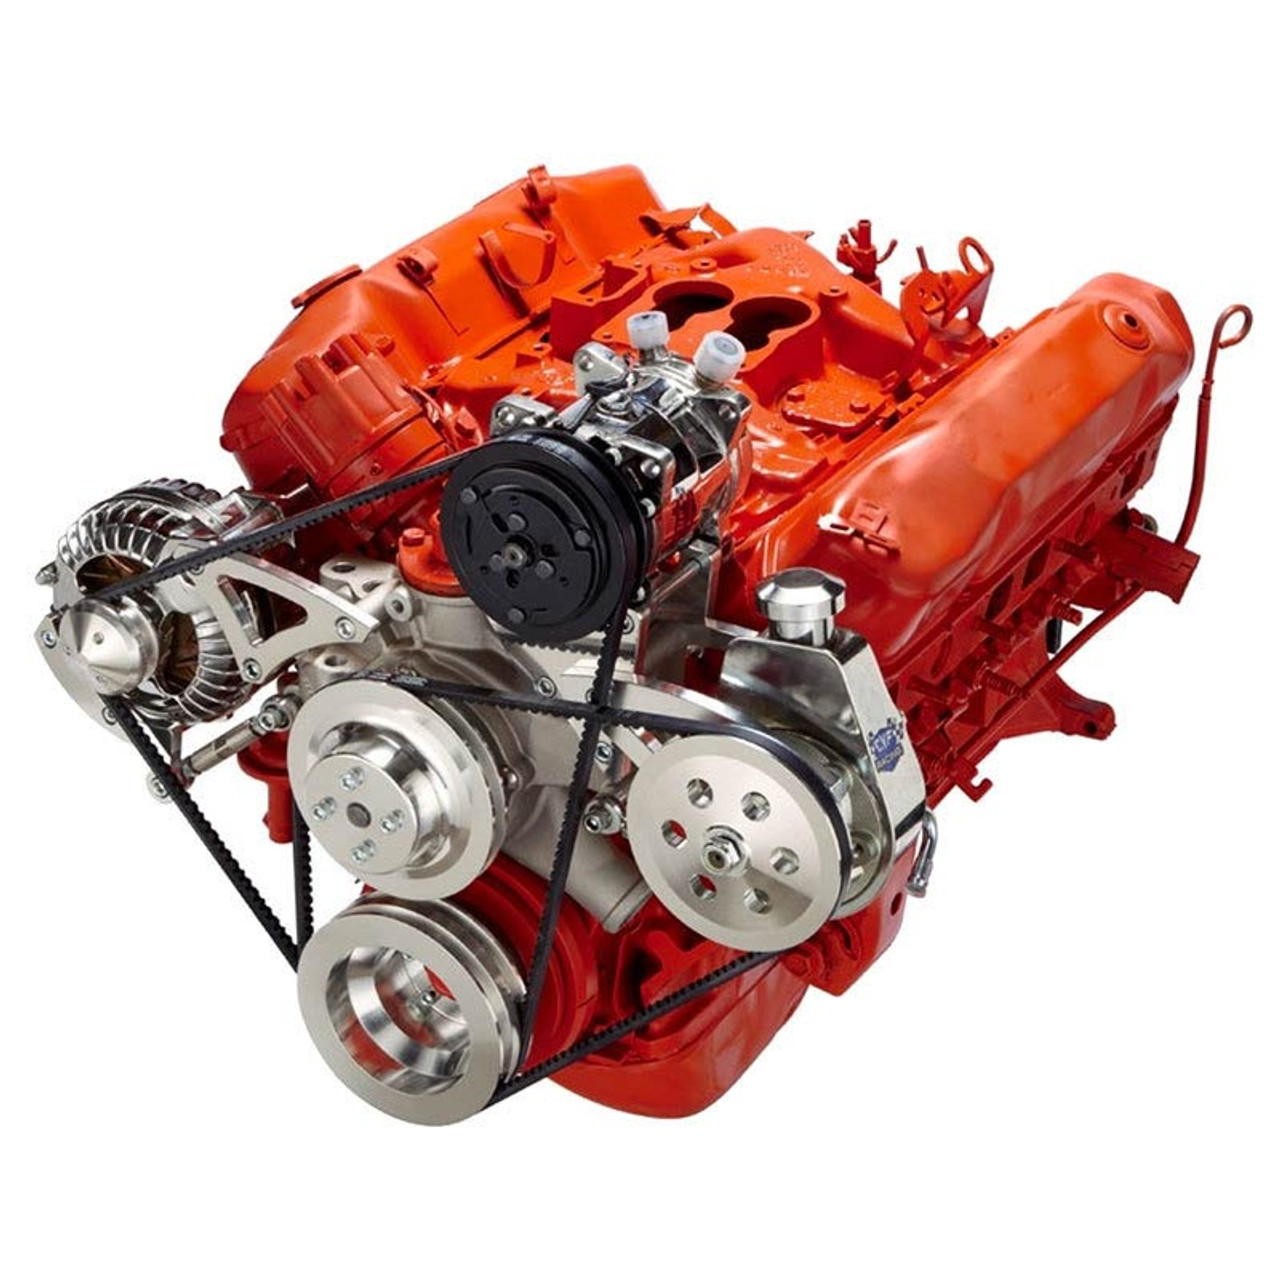 Hemi Engine Diagram Without Ac on